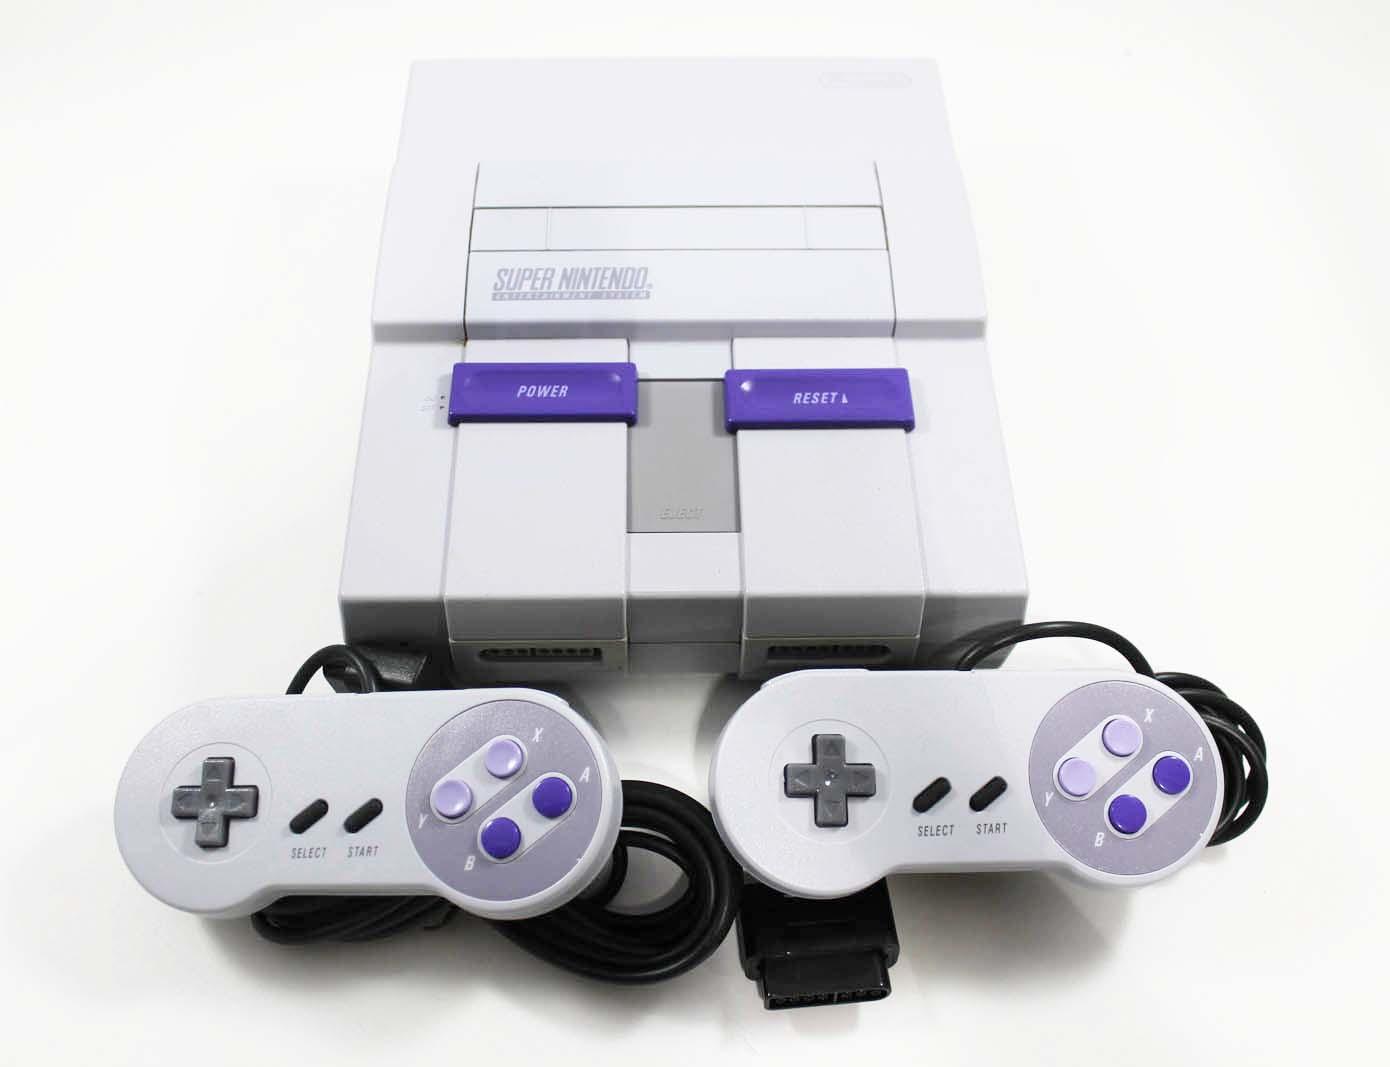 Original Super Nintendo System In Great Condition